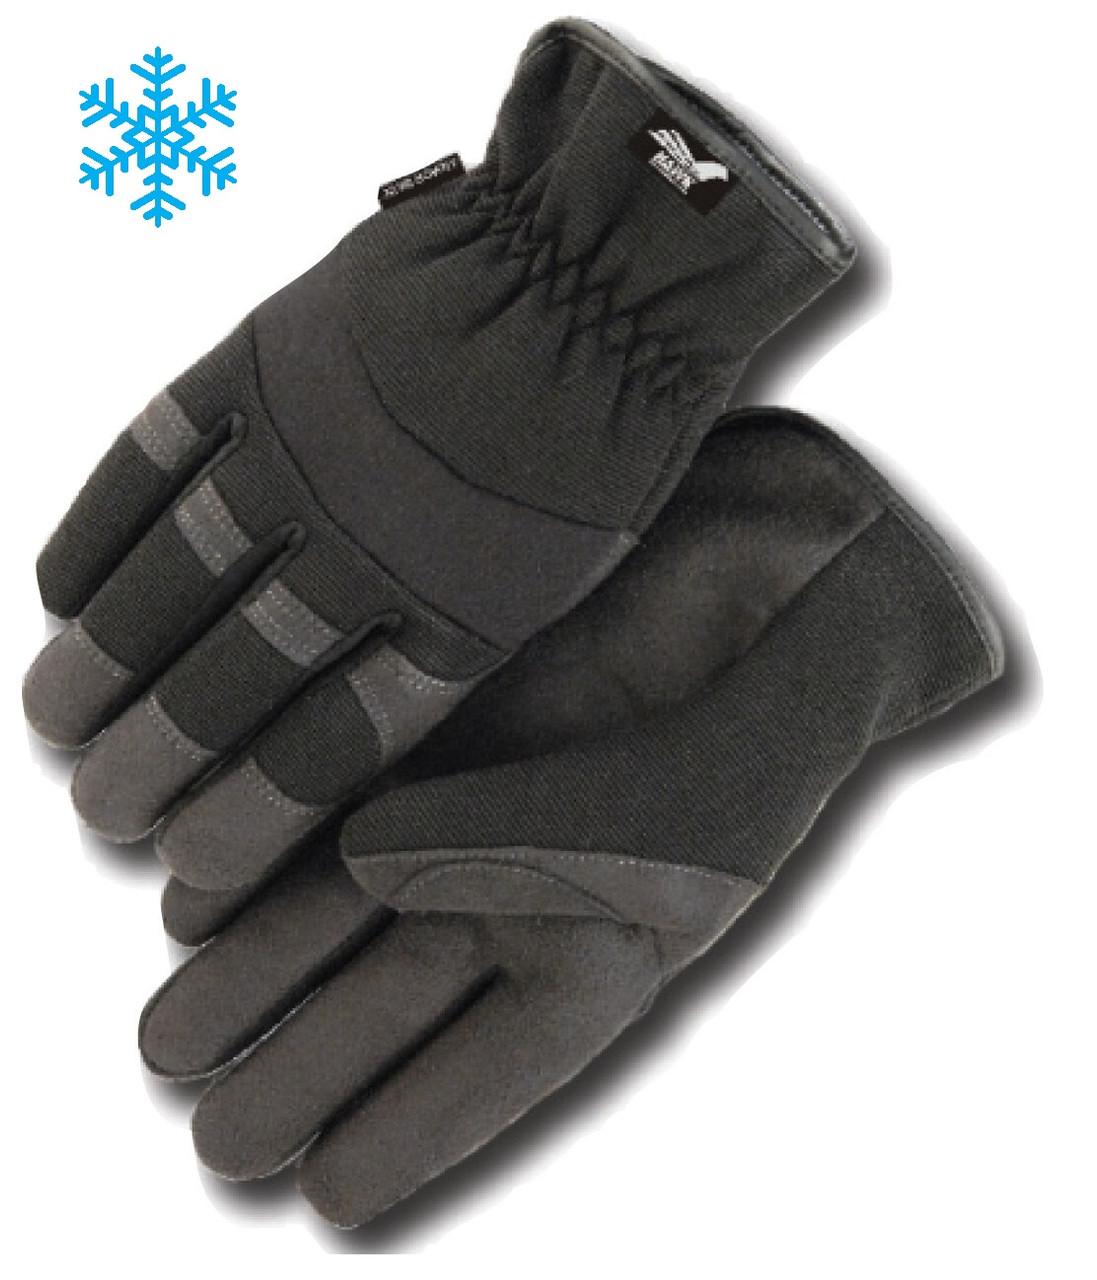 Majestic Winter Hawk Insulated Mechanics Gloves Mechanic Gloves